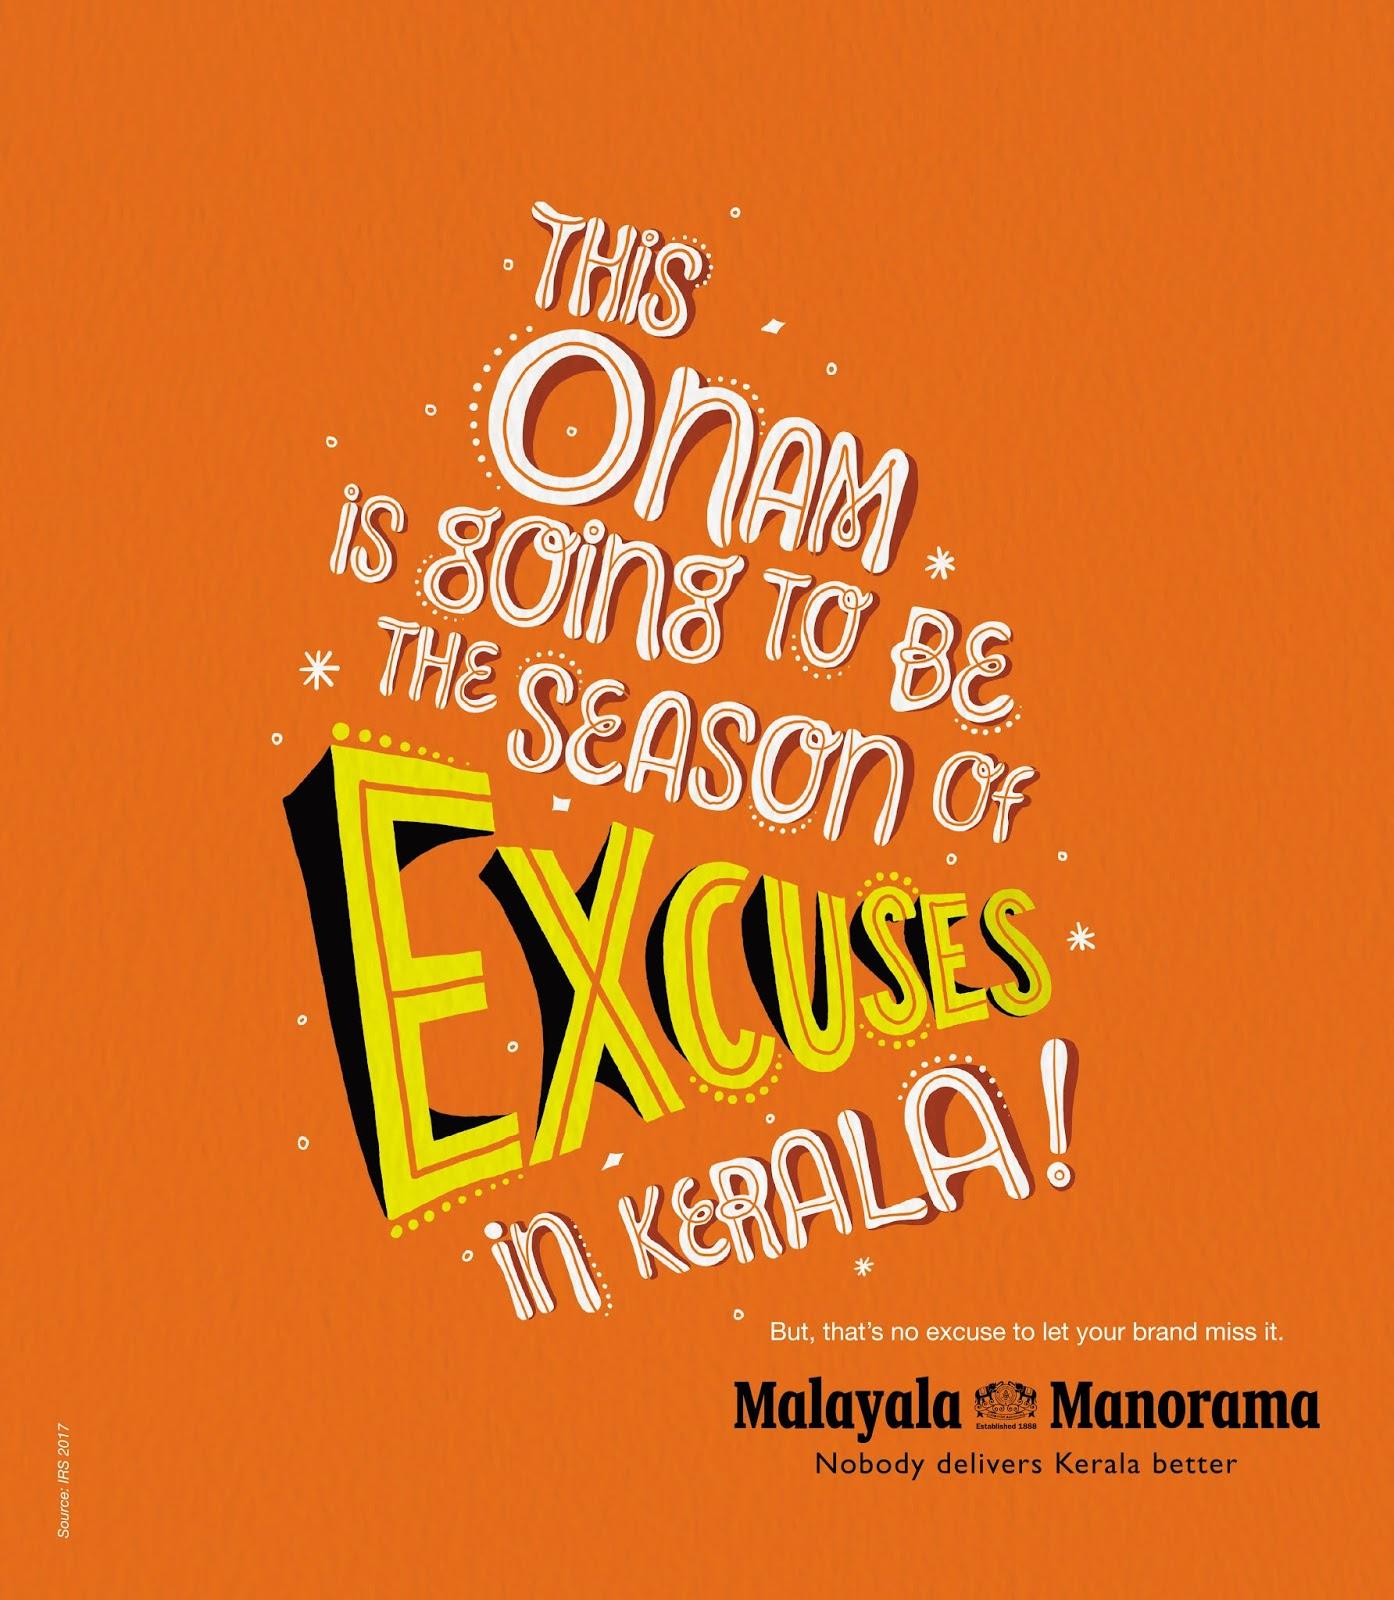 Malayala Manorama | The Season of Excuses 1 | Stark Communications Pvt Ltd